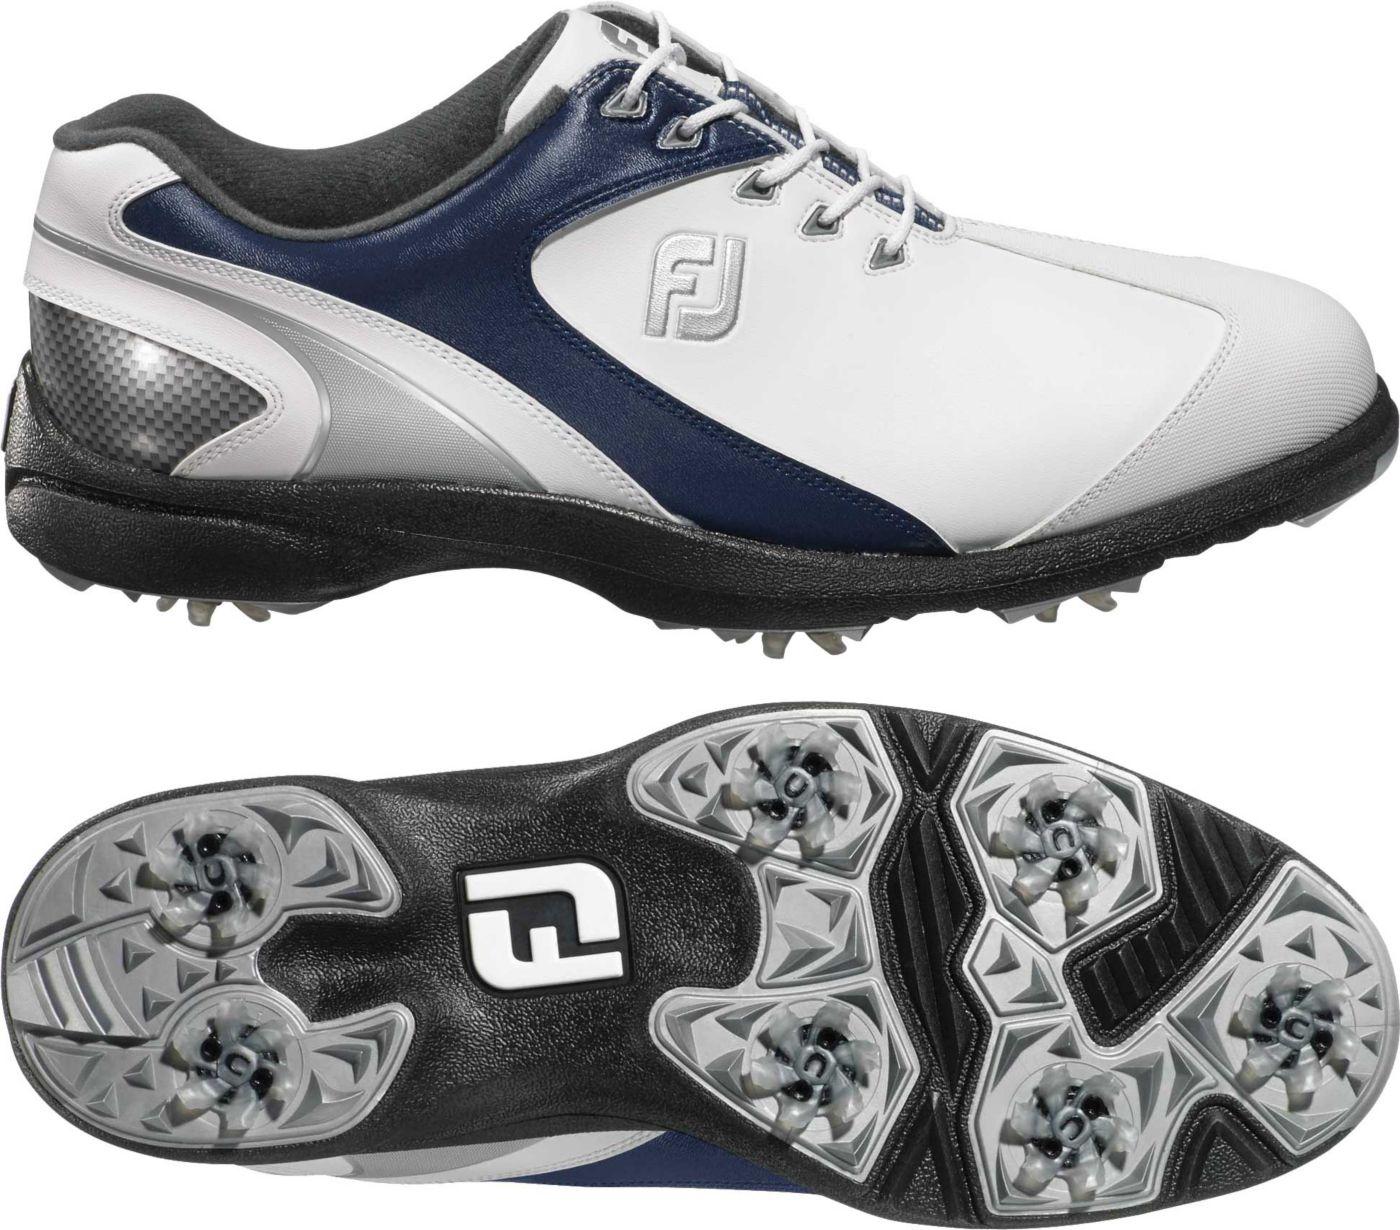 FootJoy Men's Sport LT Golf Shoes (Previous Season Style)